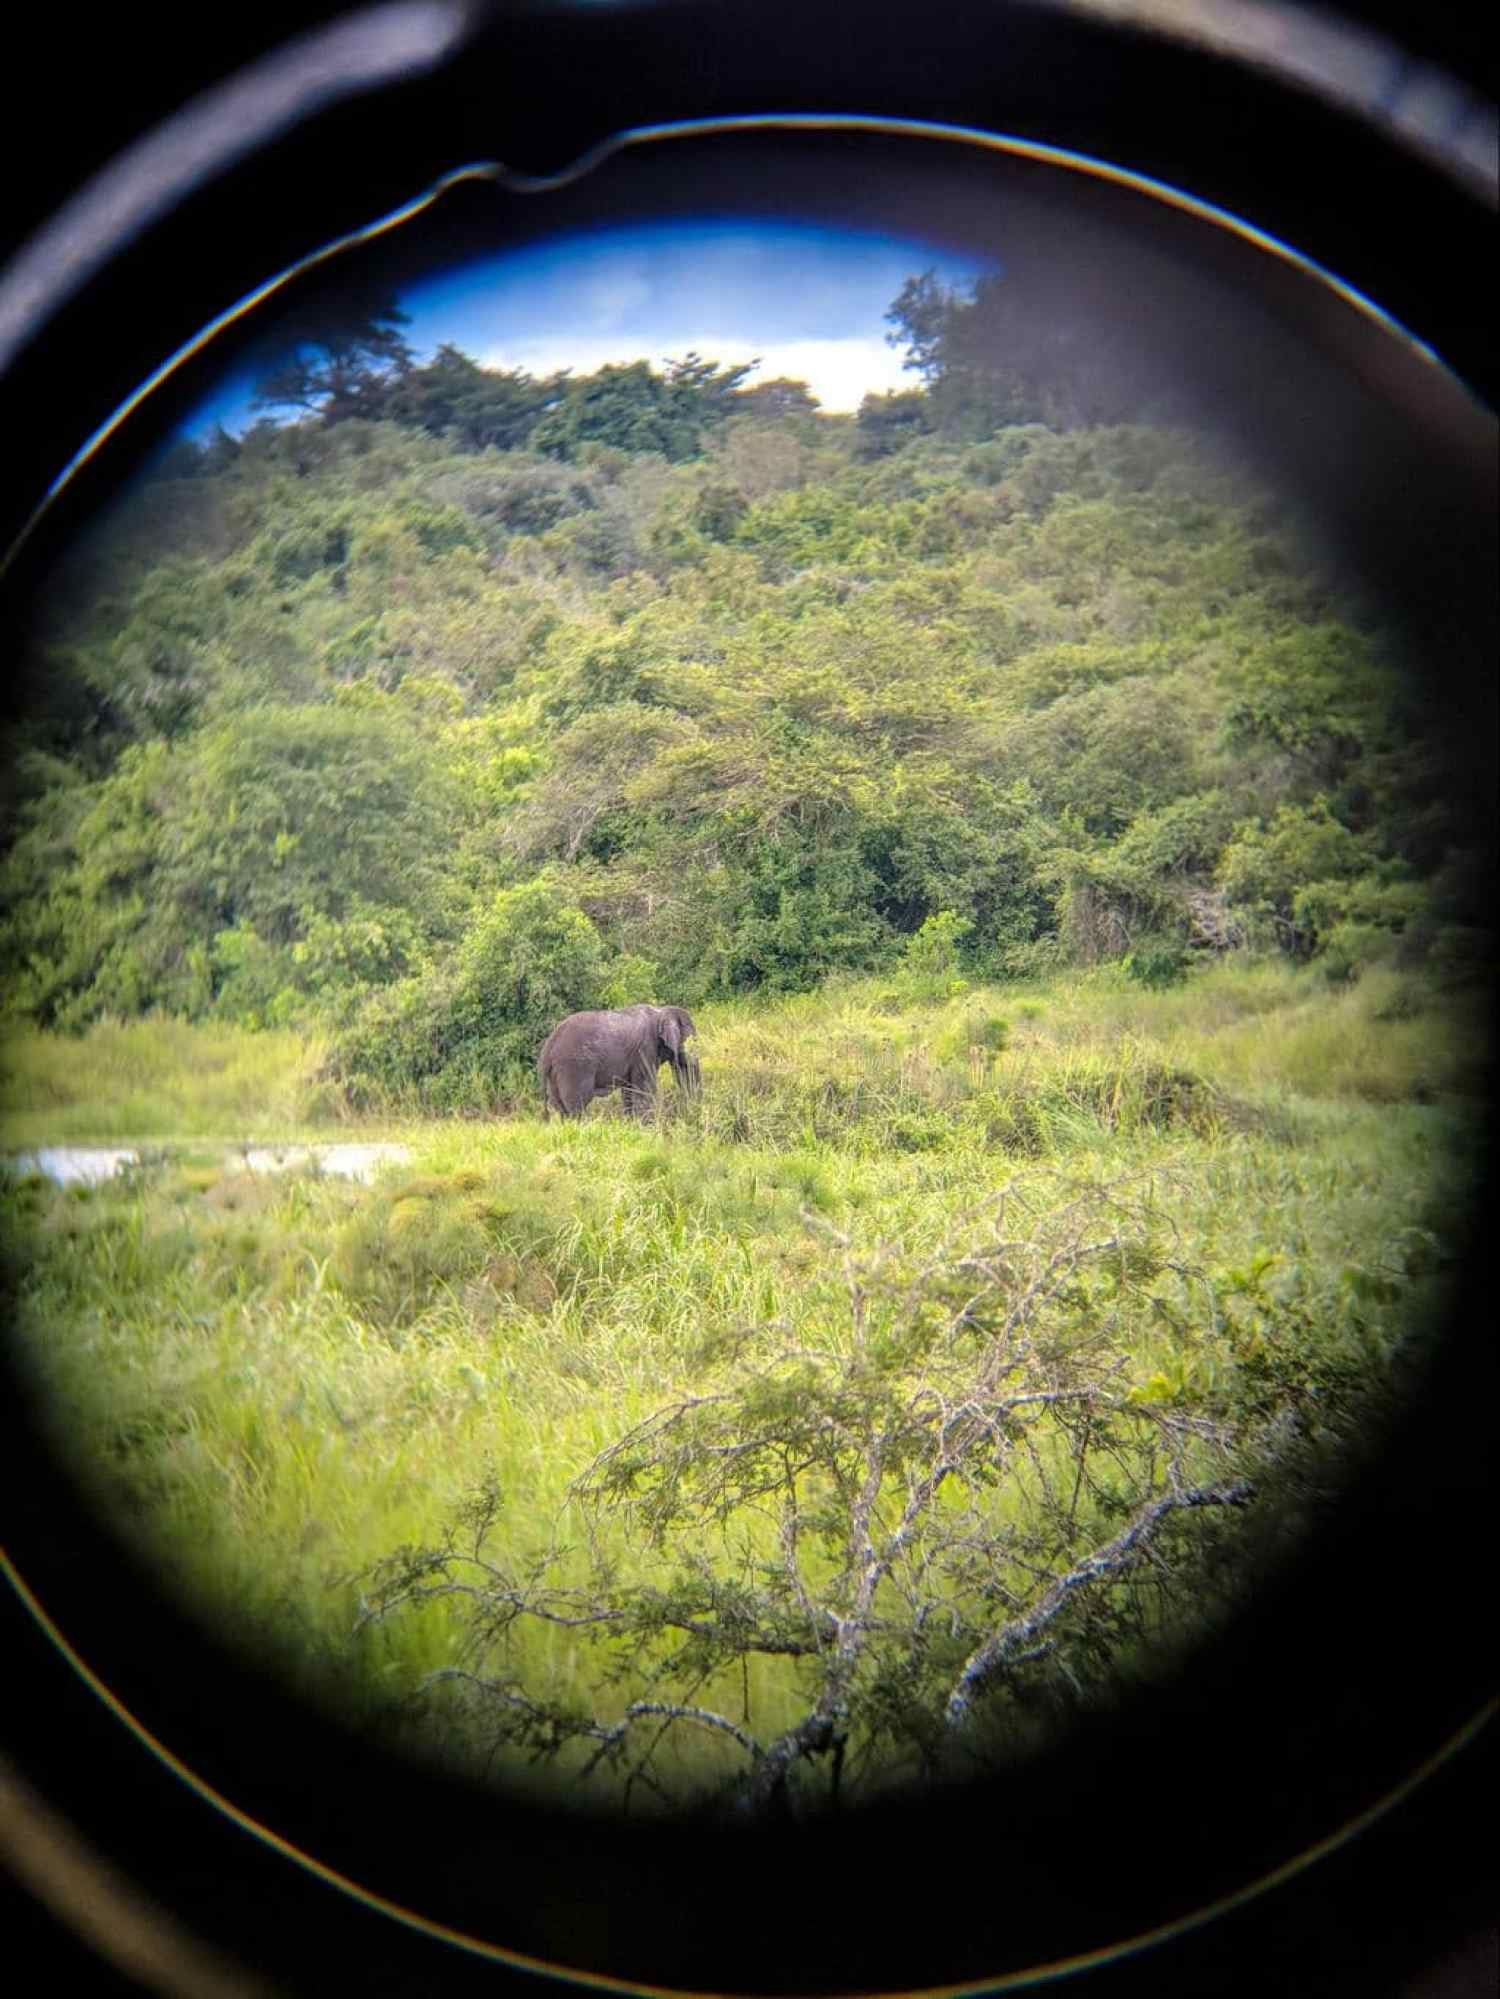 Hard to spot elephants through a binocular